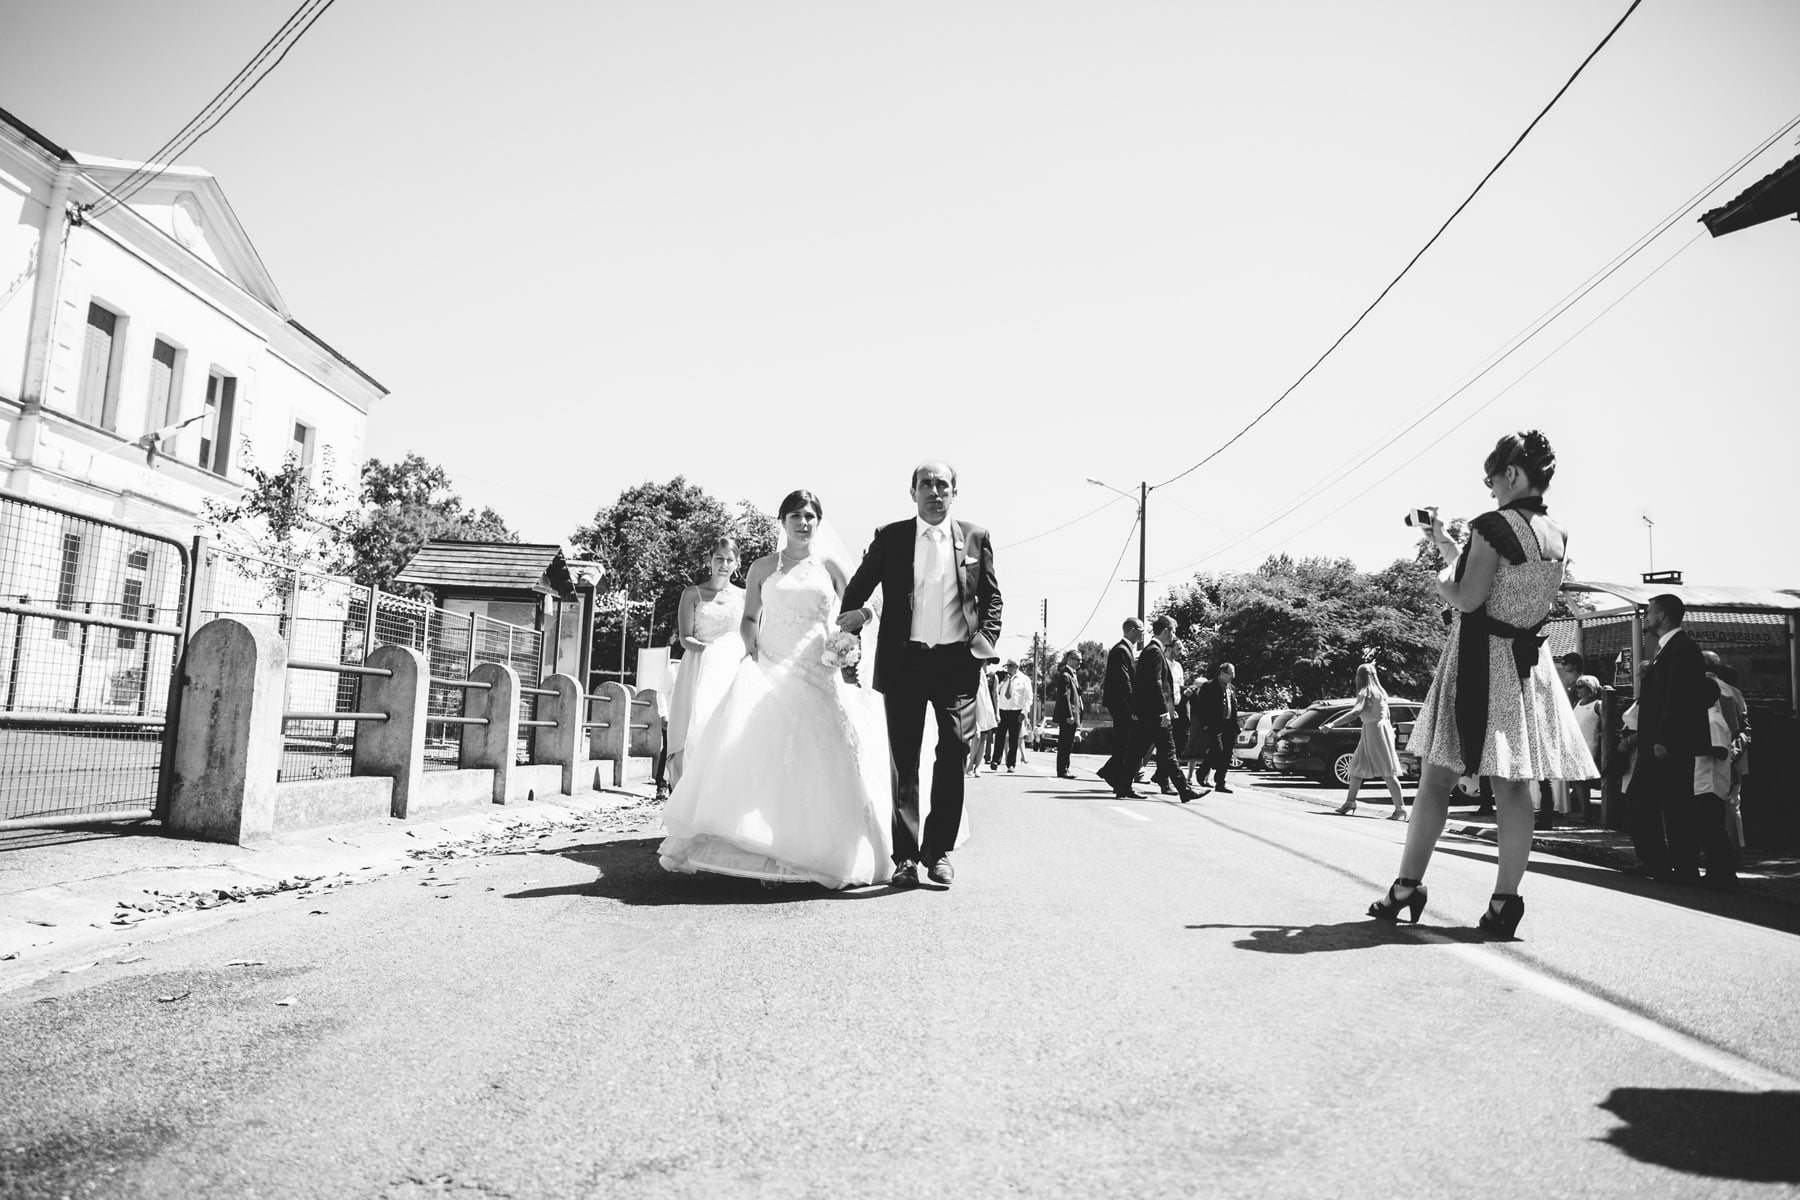 photographe mariage bordeaux landes fineart francais sarah miramon blog 09